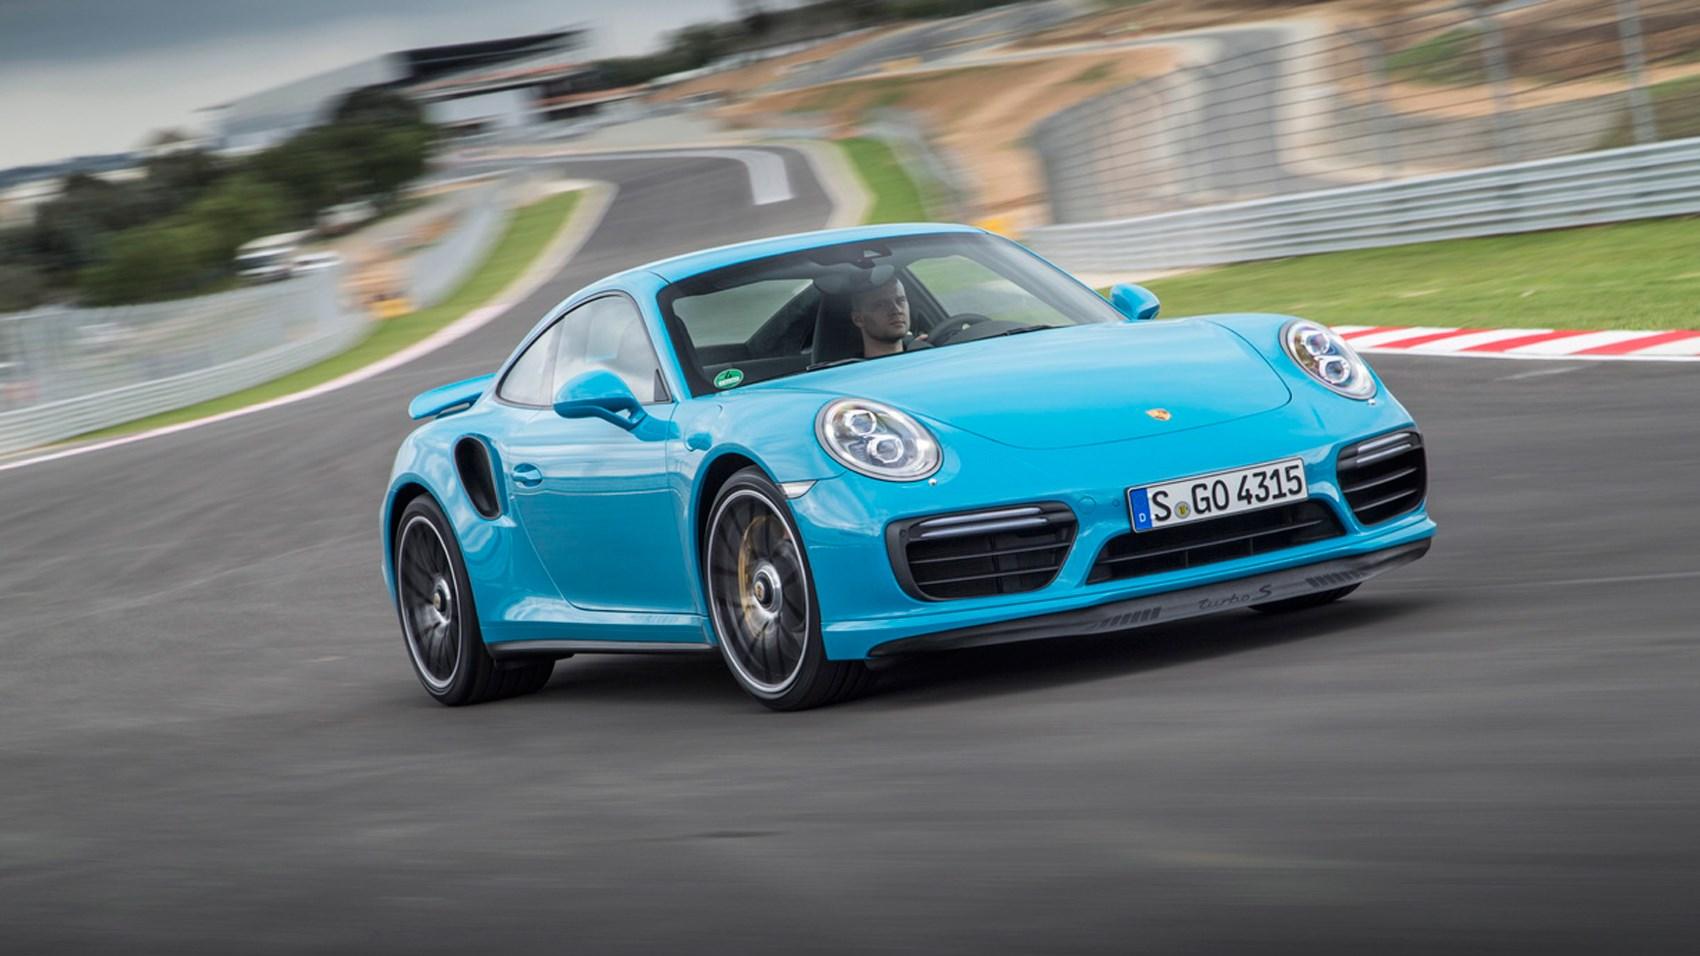 porsche 911 turbo s 2016 review by car magazine. Black Bedroom Furniture Sets. Home Design Ideas